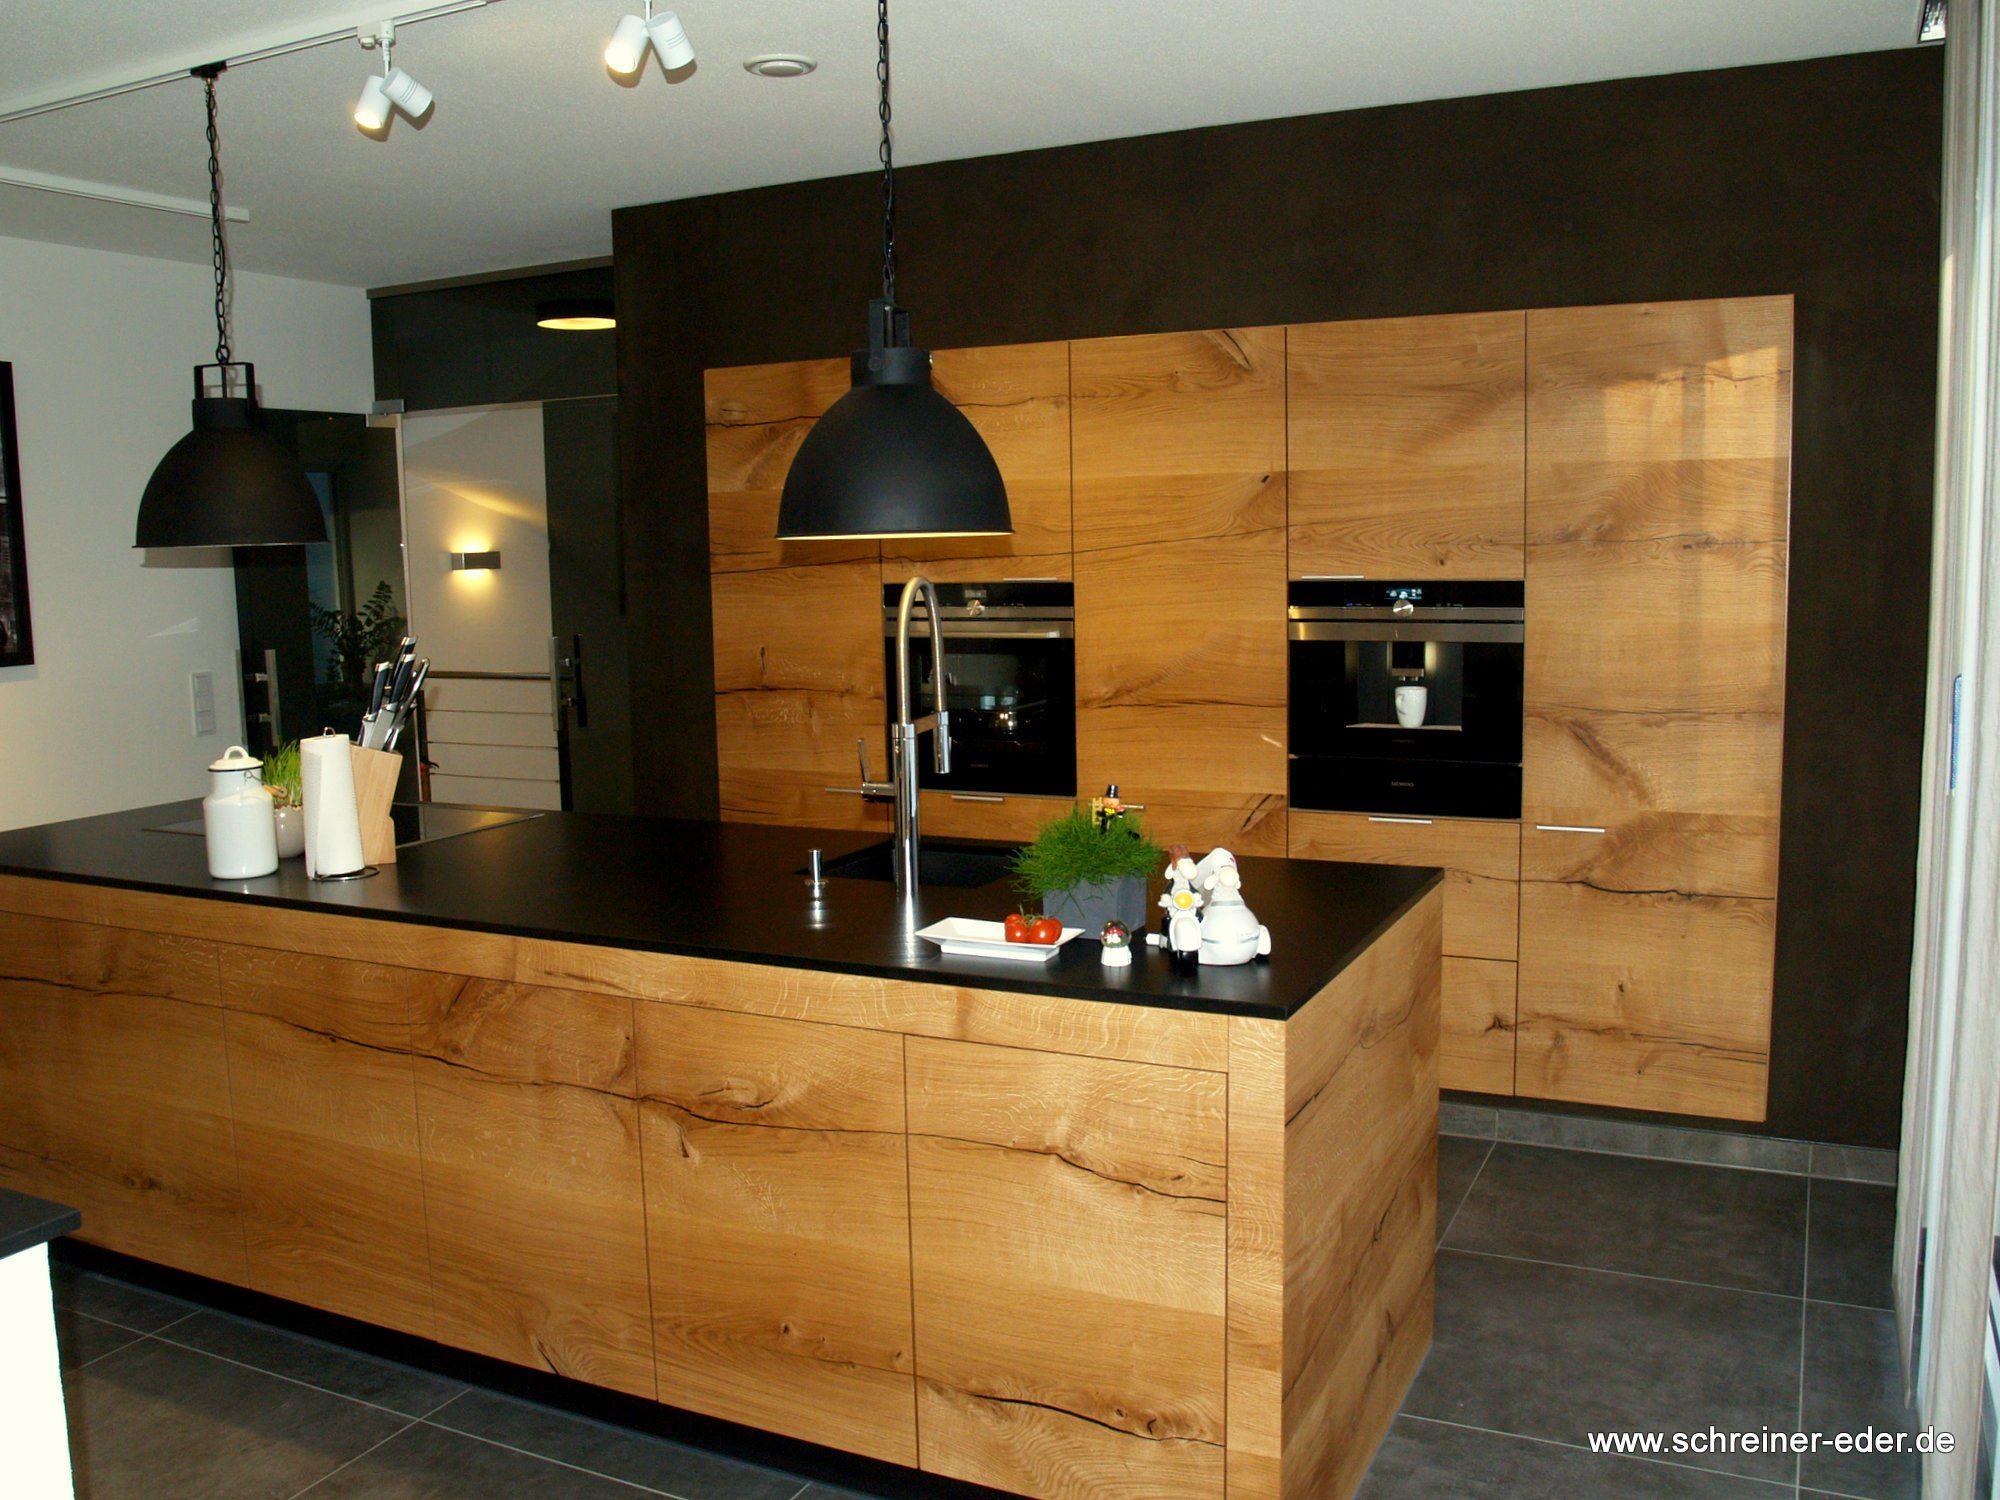 Full Size of Massivholzküche Abverkauf Massivholzkchen Moderne Massivholzkche Was Kostet Eine Inselküche Bad Wohnzimmer Massivholzküche Abverkauf